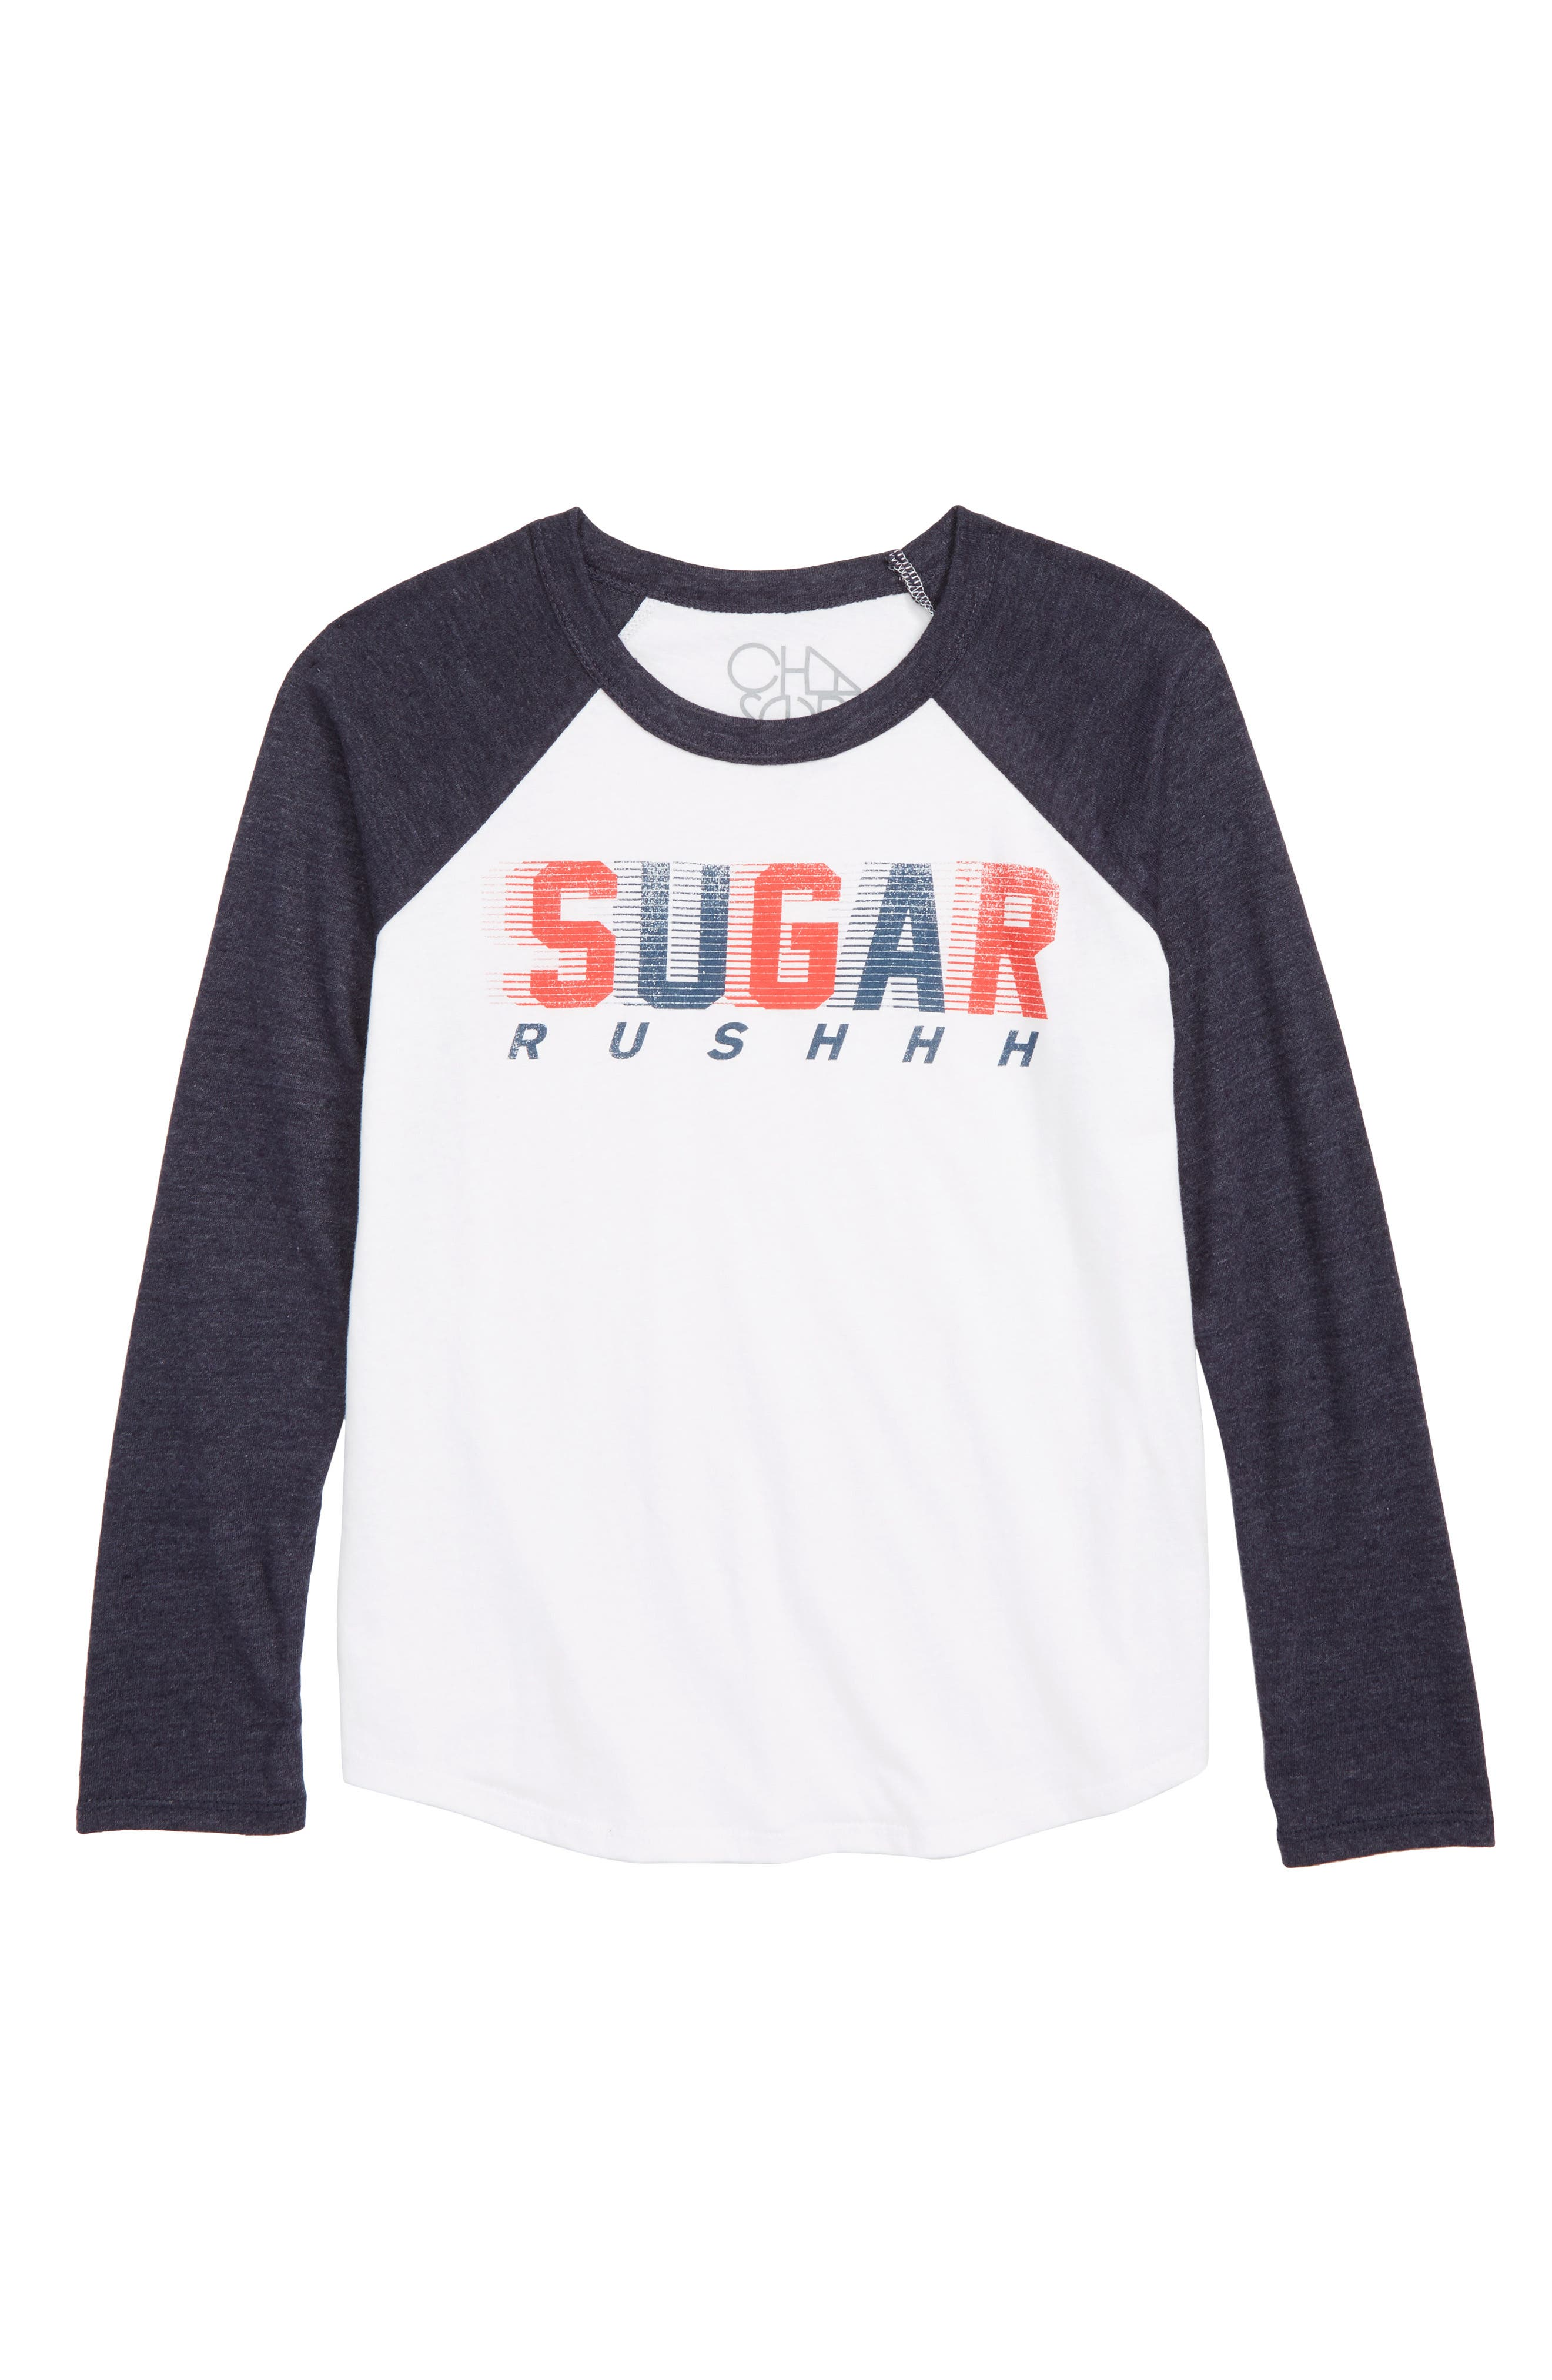 CHASER Sugar Rush Graphic T-Shirt, Main, color, WHITE / AVALON